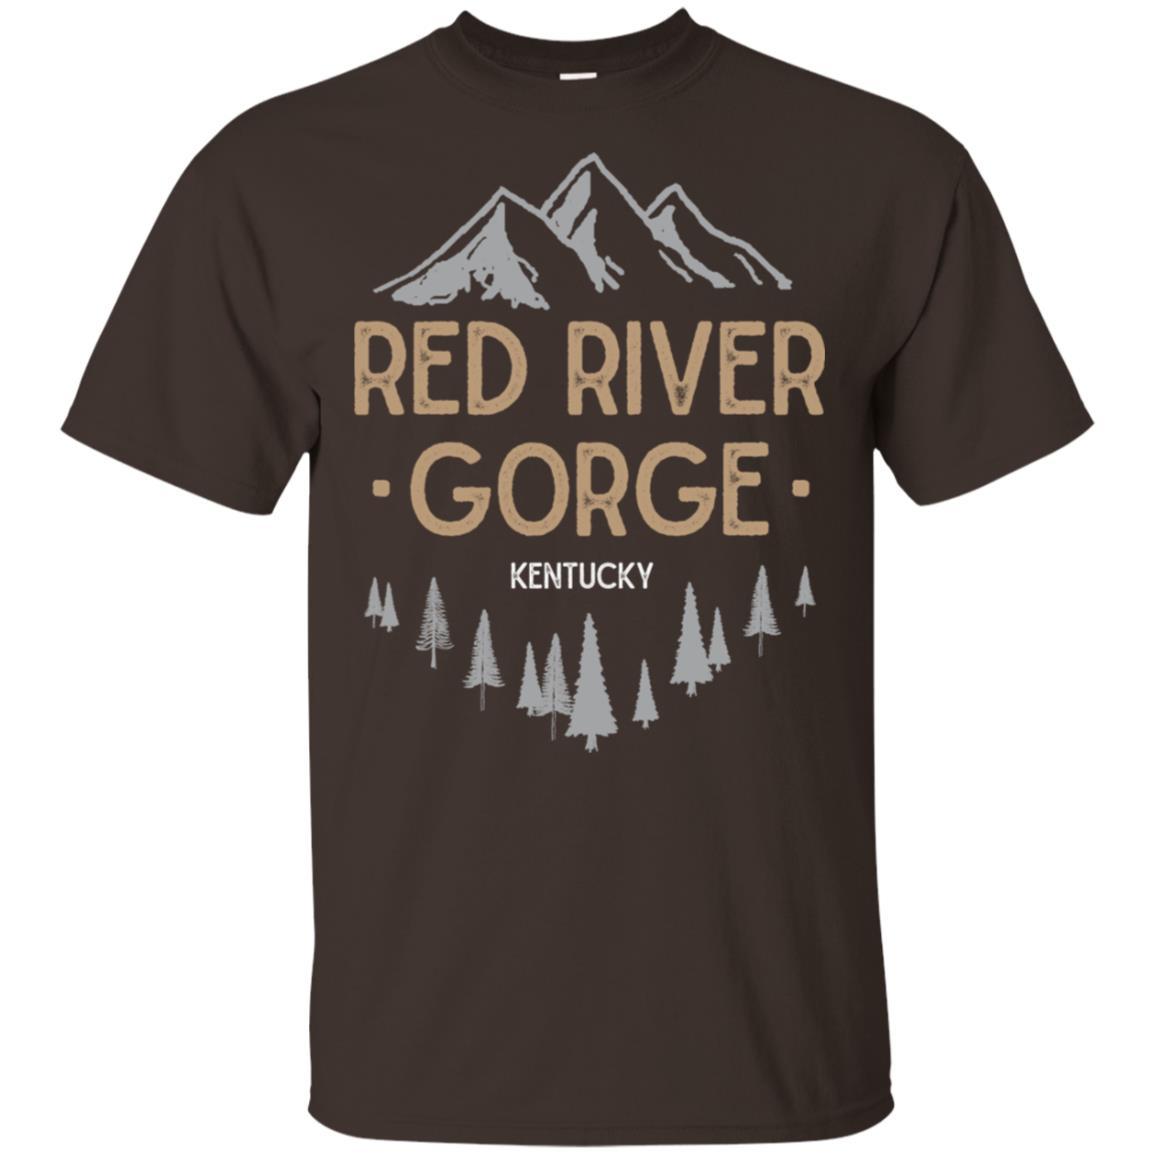 Red River Gorge Kentucky Ky Vintage Unisex Short Sleeve